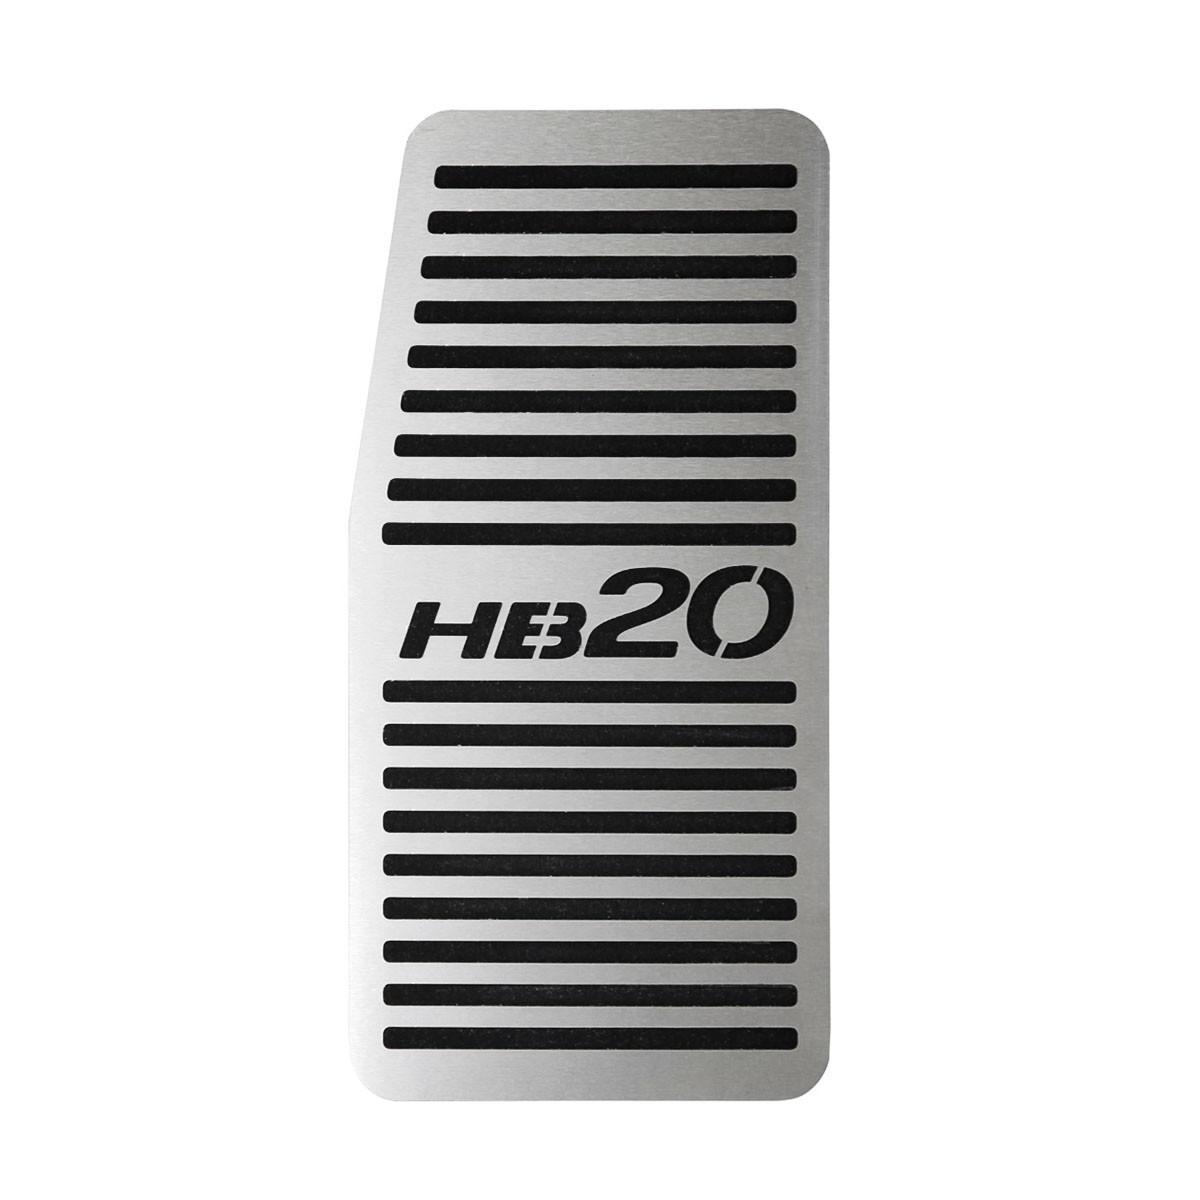 Descanso de Pé Hyundai HB20 Aço Inox Escovado